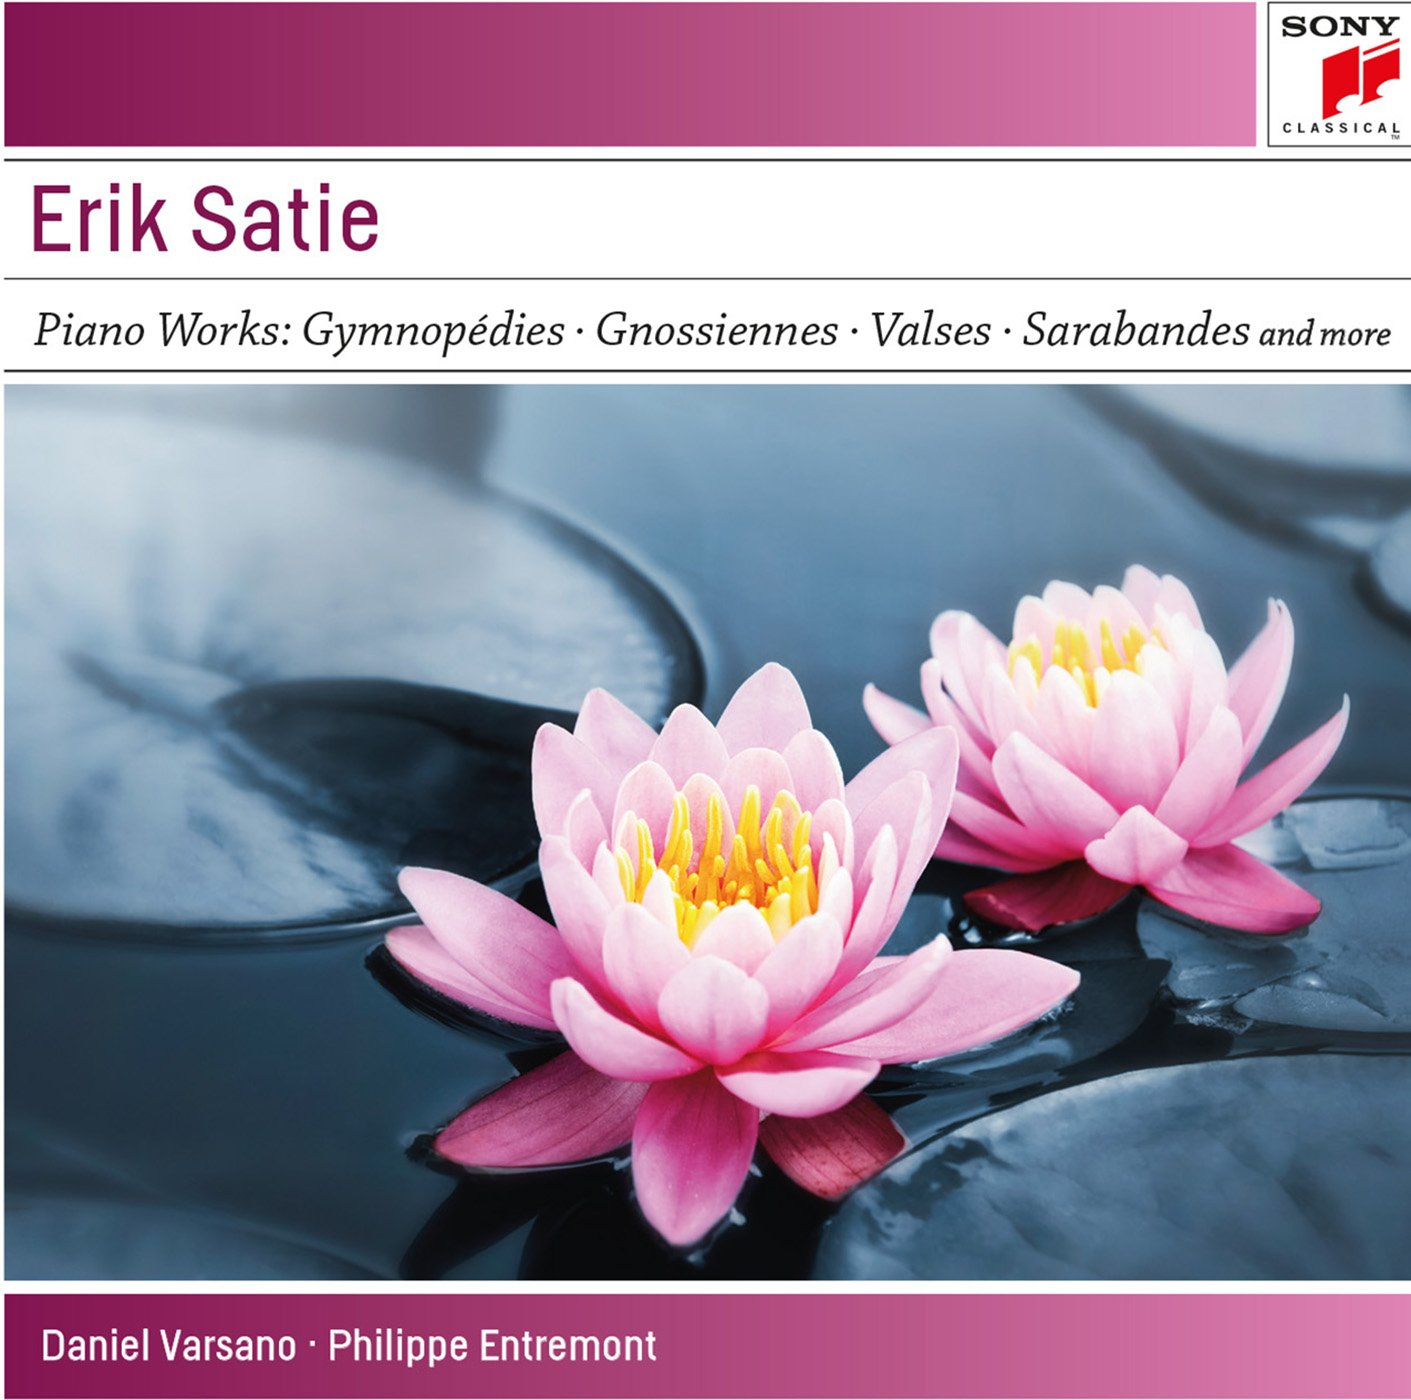 Philippe entremont erik satie satie piano works amazon philippe entremont erik satie satie piano works amazon music izmirmasajfo